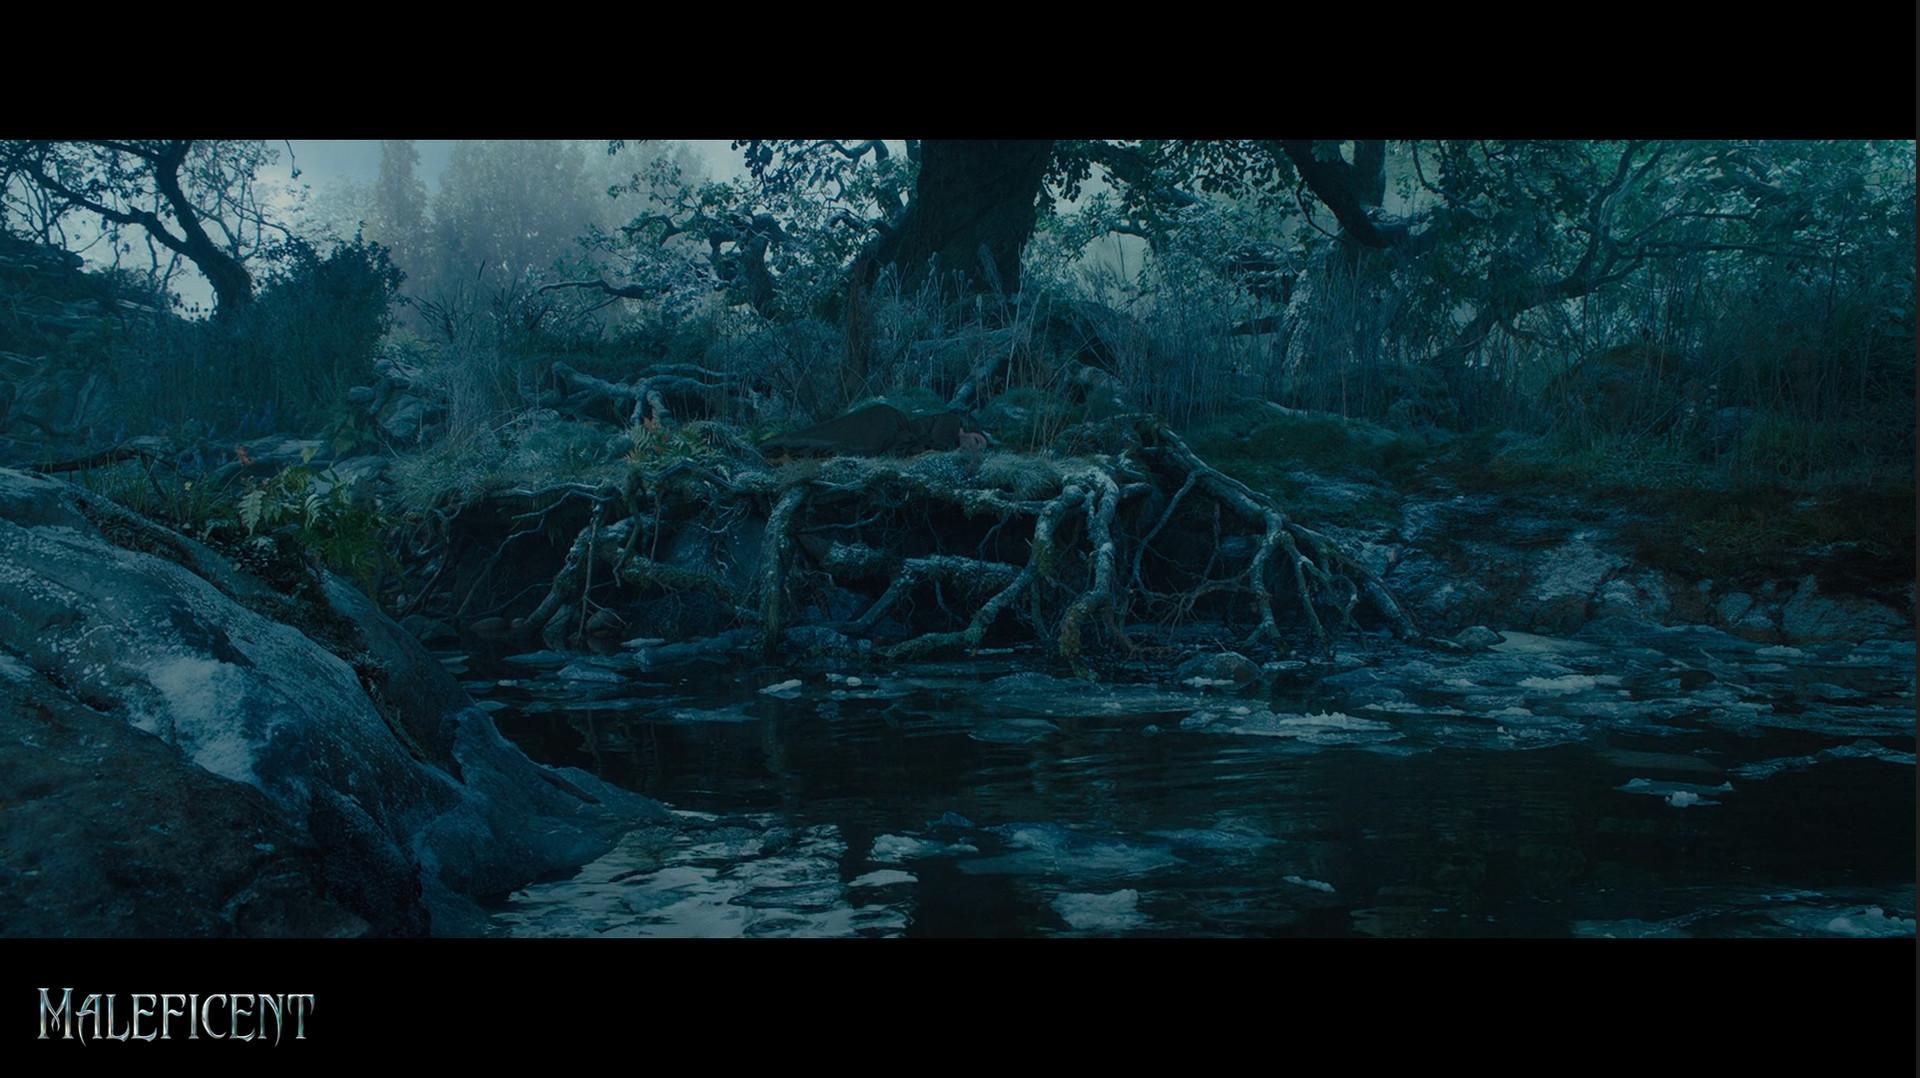 Forest Wallpaper Hd Artstation Maleficent Forest Anissa Senoussi Nicastro